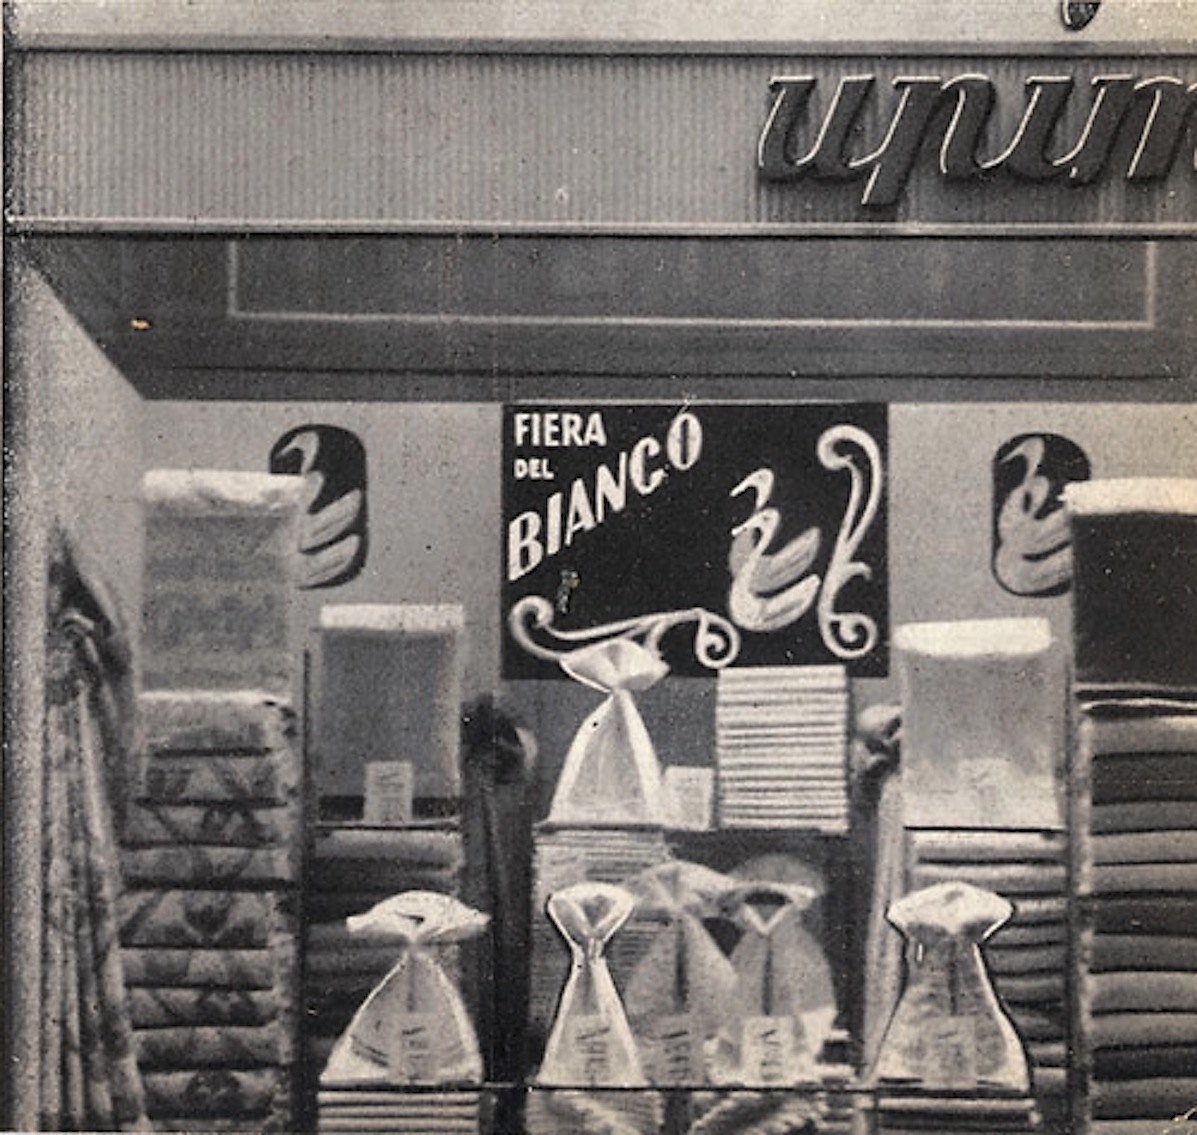 upim_premio_vetrine_magazzini_genova_1950